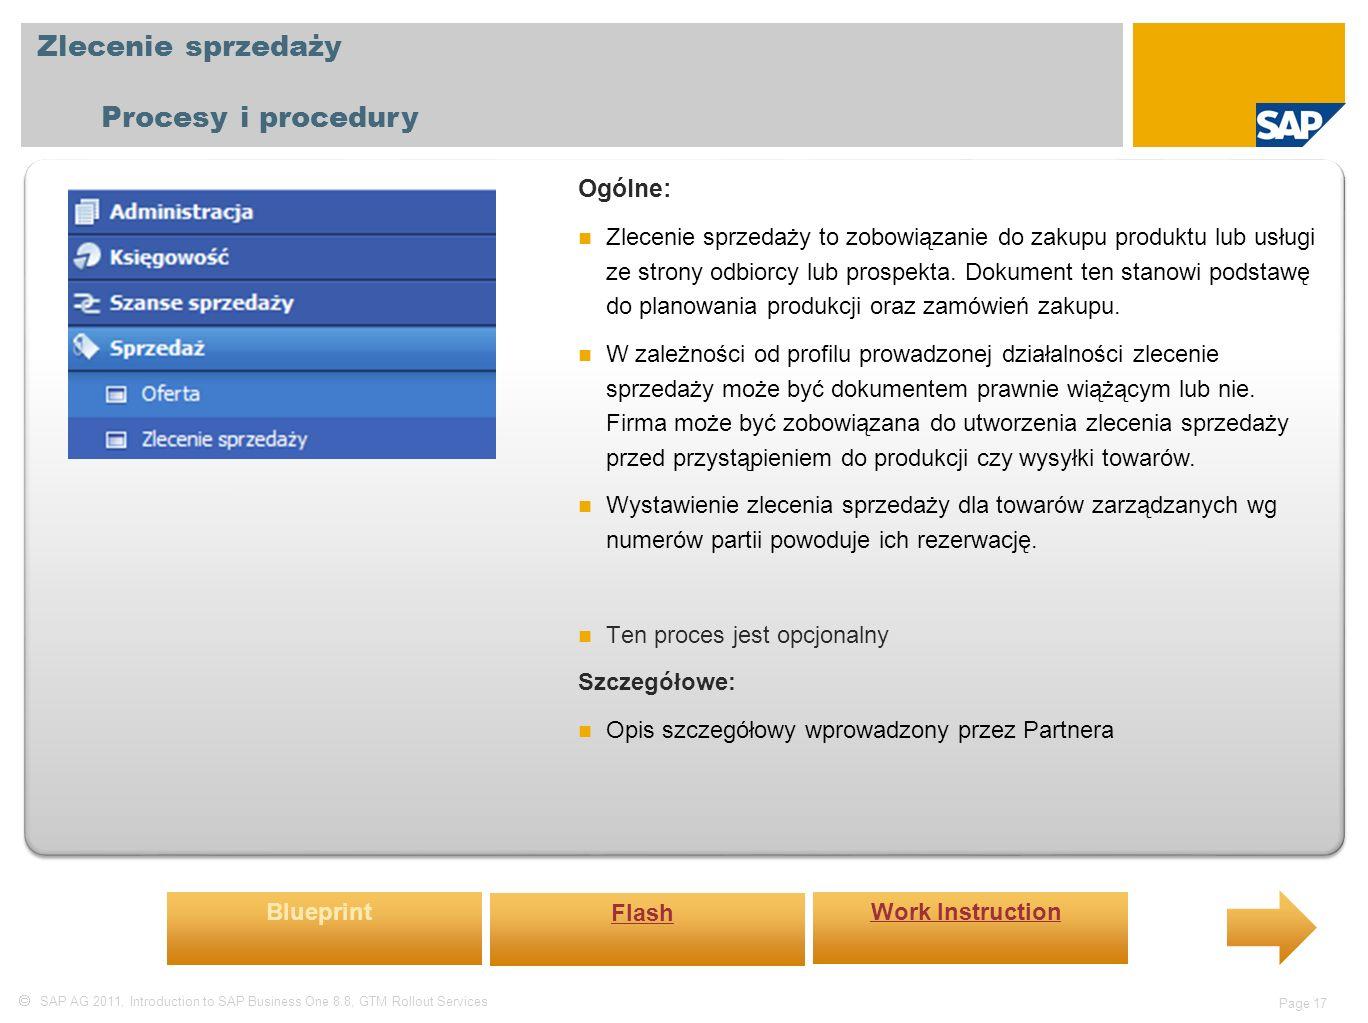  SAP AG 2011, Introduction to SAP Business One 8.8, GTM Rollout Services Page 17 Zlecenie sprzedaży Procesy i procedury Ogólne: Zlecenie sprzedaży to